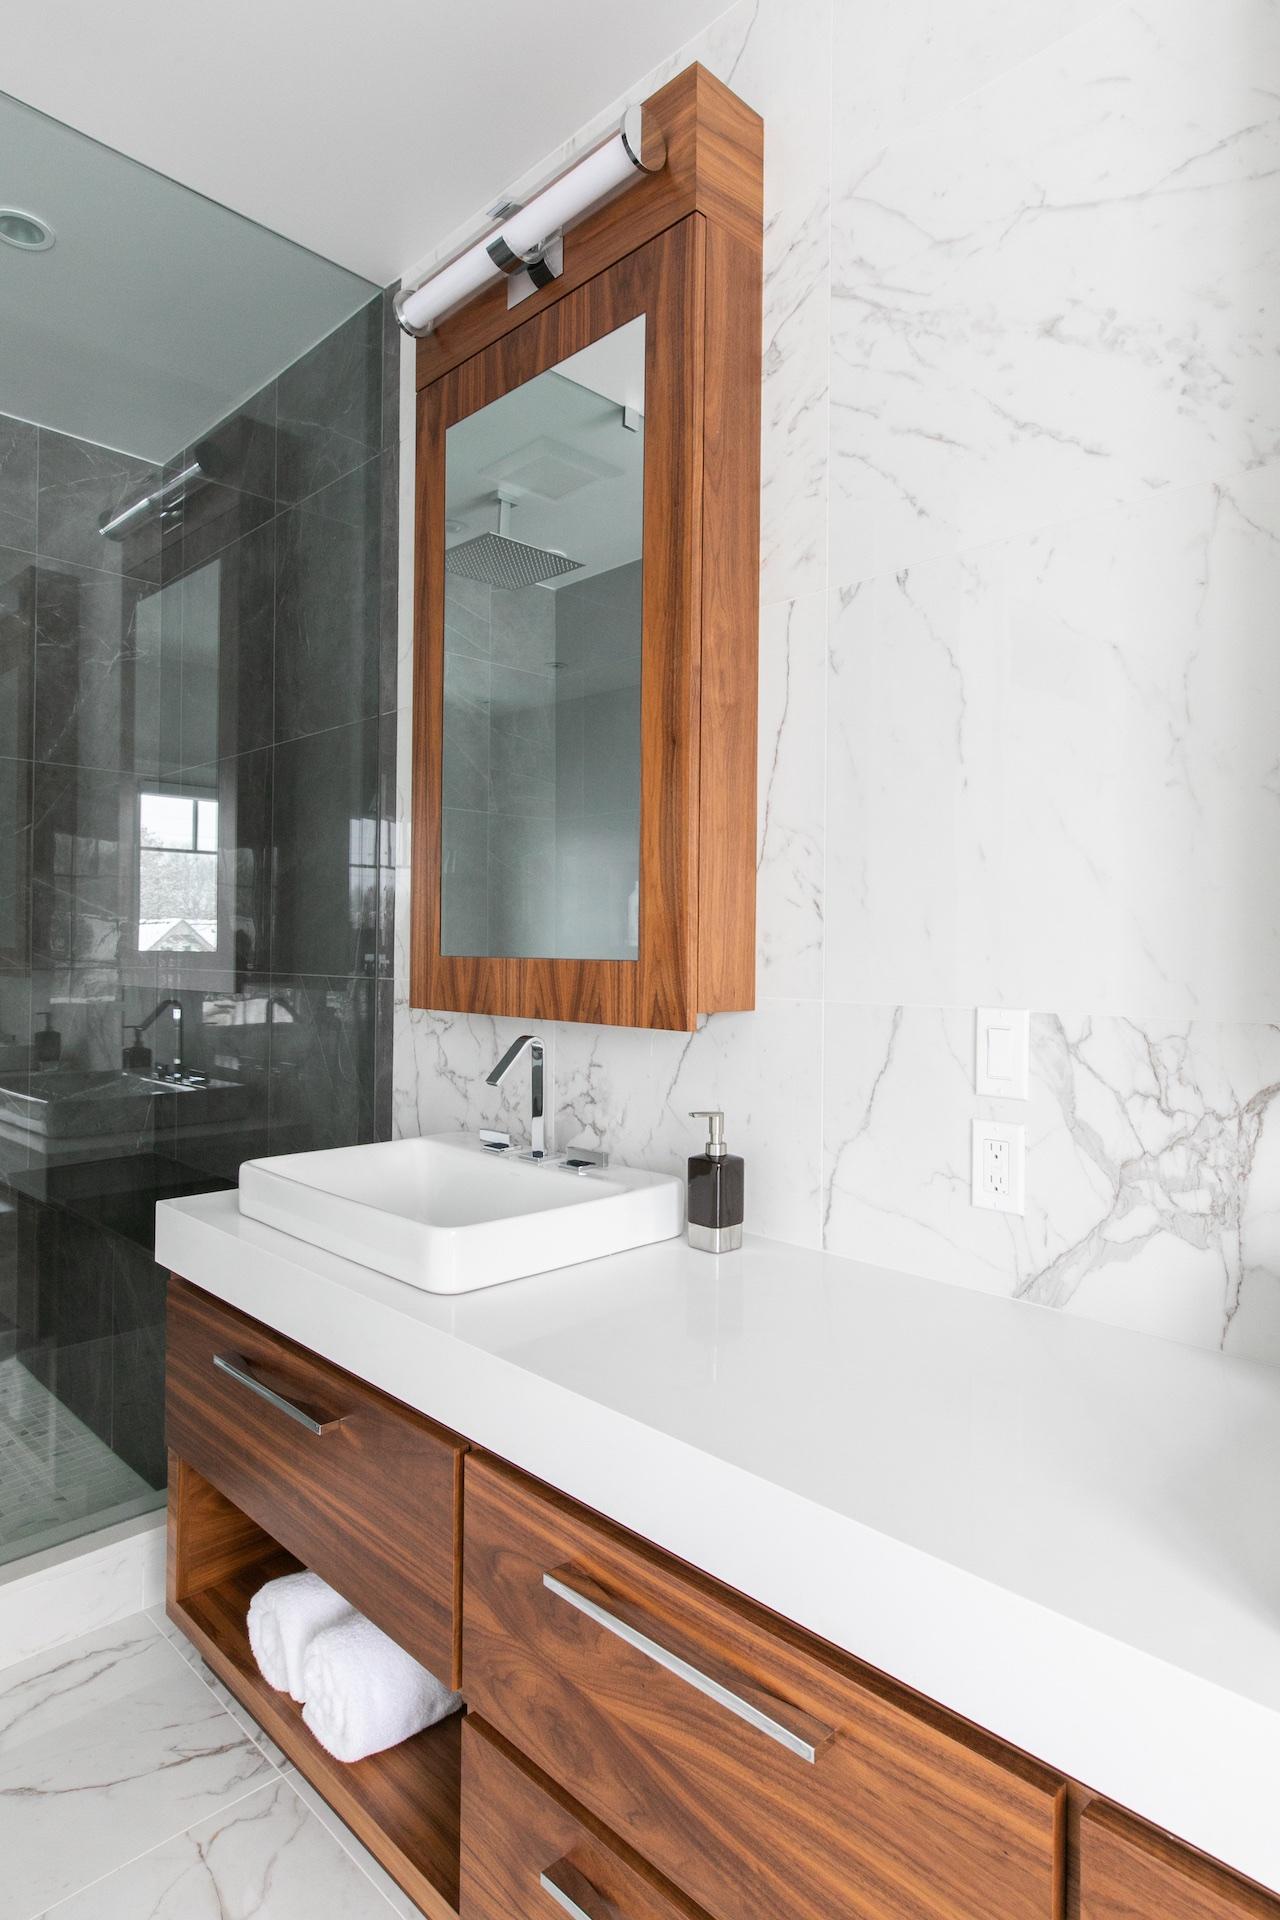 wood vanity drawers and white sink